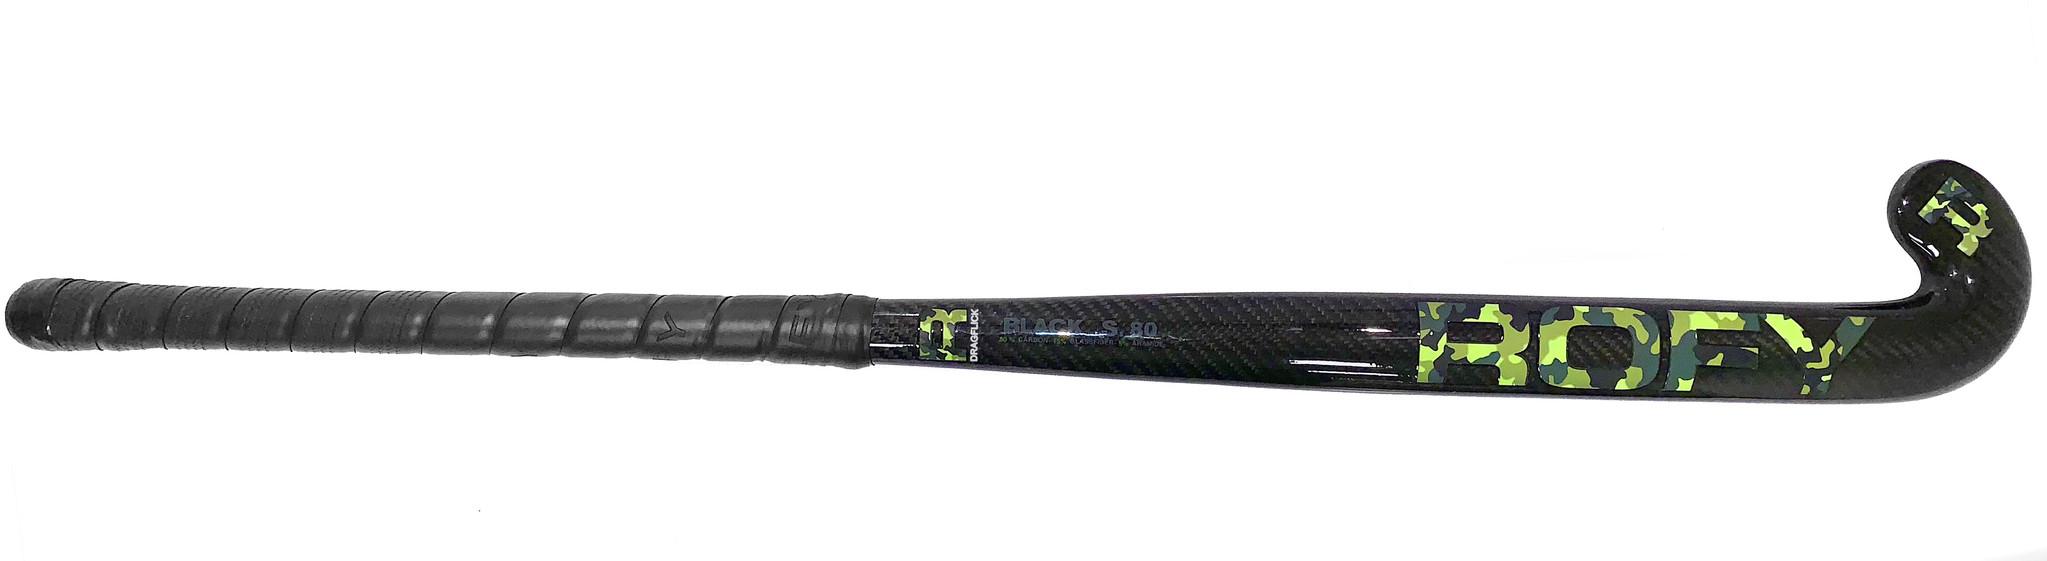 ROFY Black S. 80% Carbon Dragflick